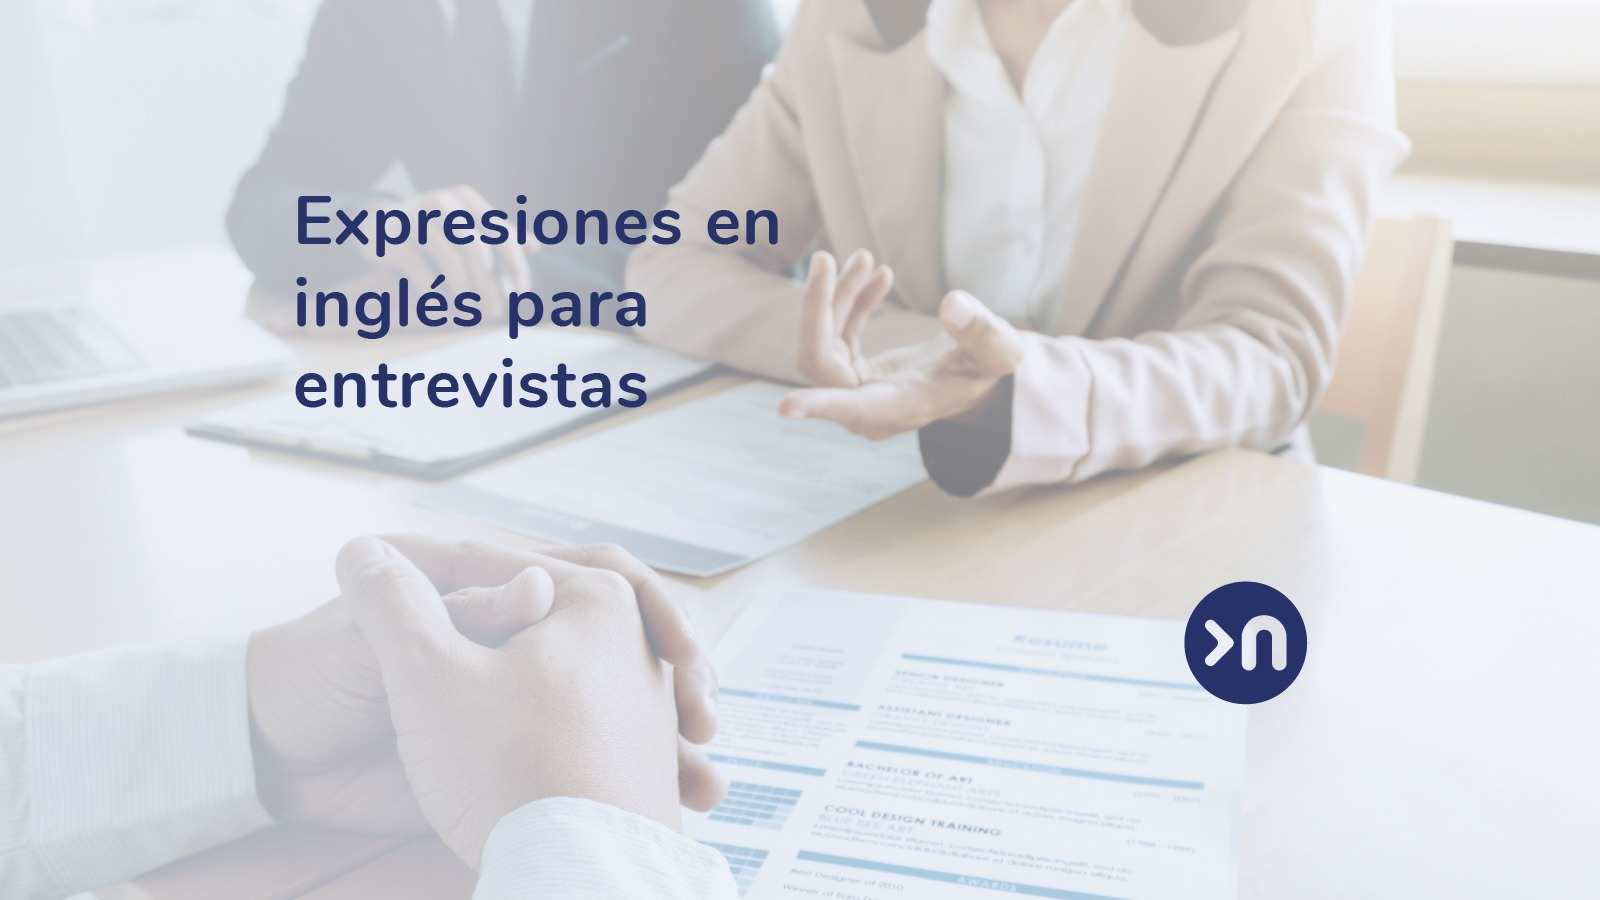 Nathalie-language-experiences-blog-tips-entrevista-trabajo-ingles